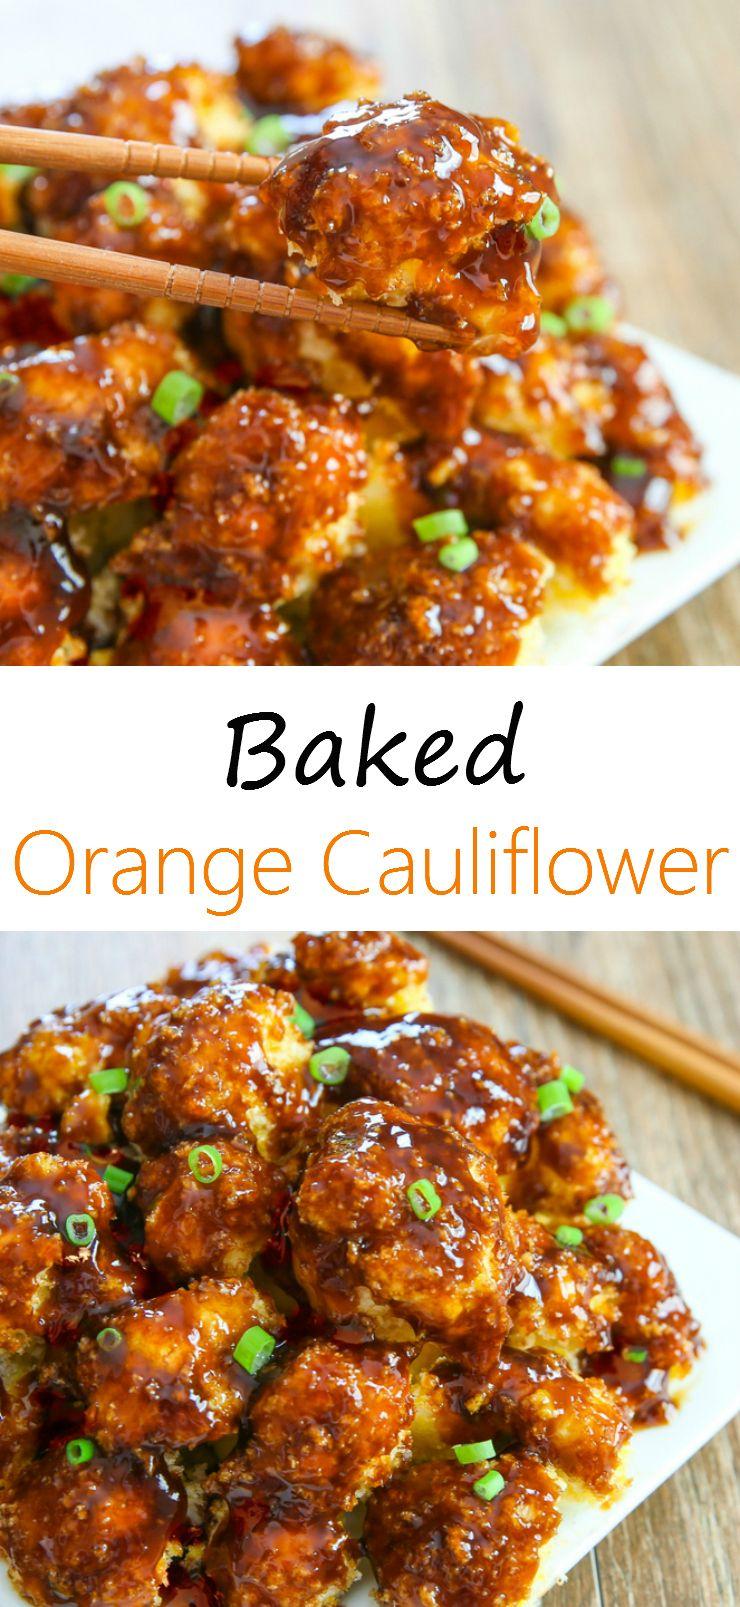 Baked Orange Cauliflower Recipe Recipes Vegetarian Recipes Vegetarian Vegan Recipes